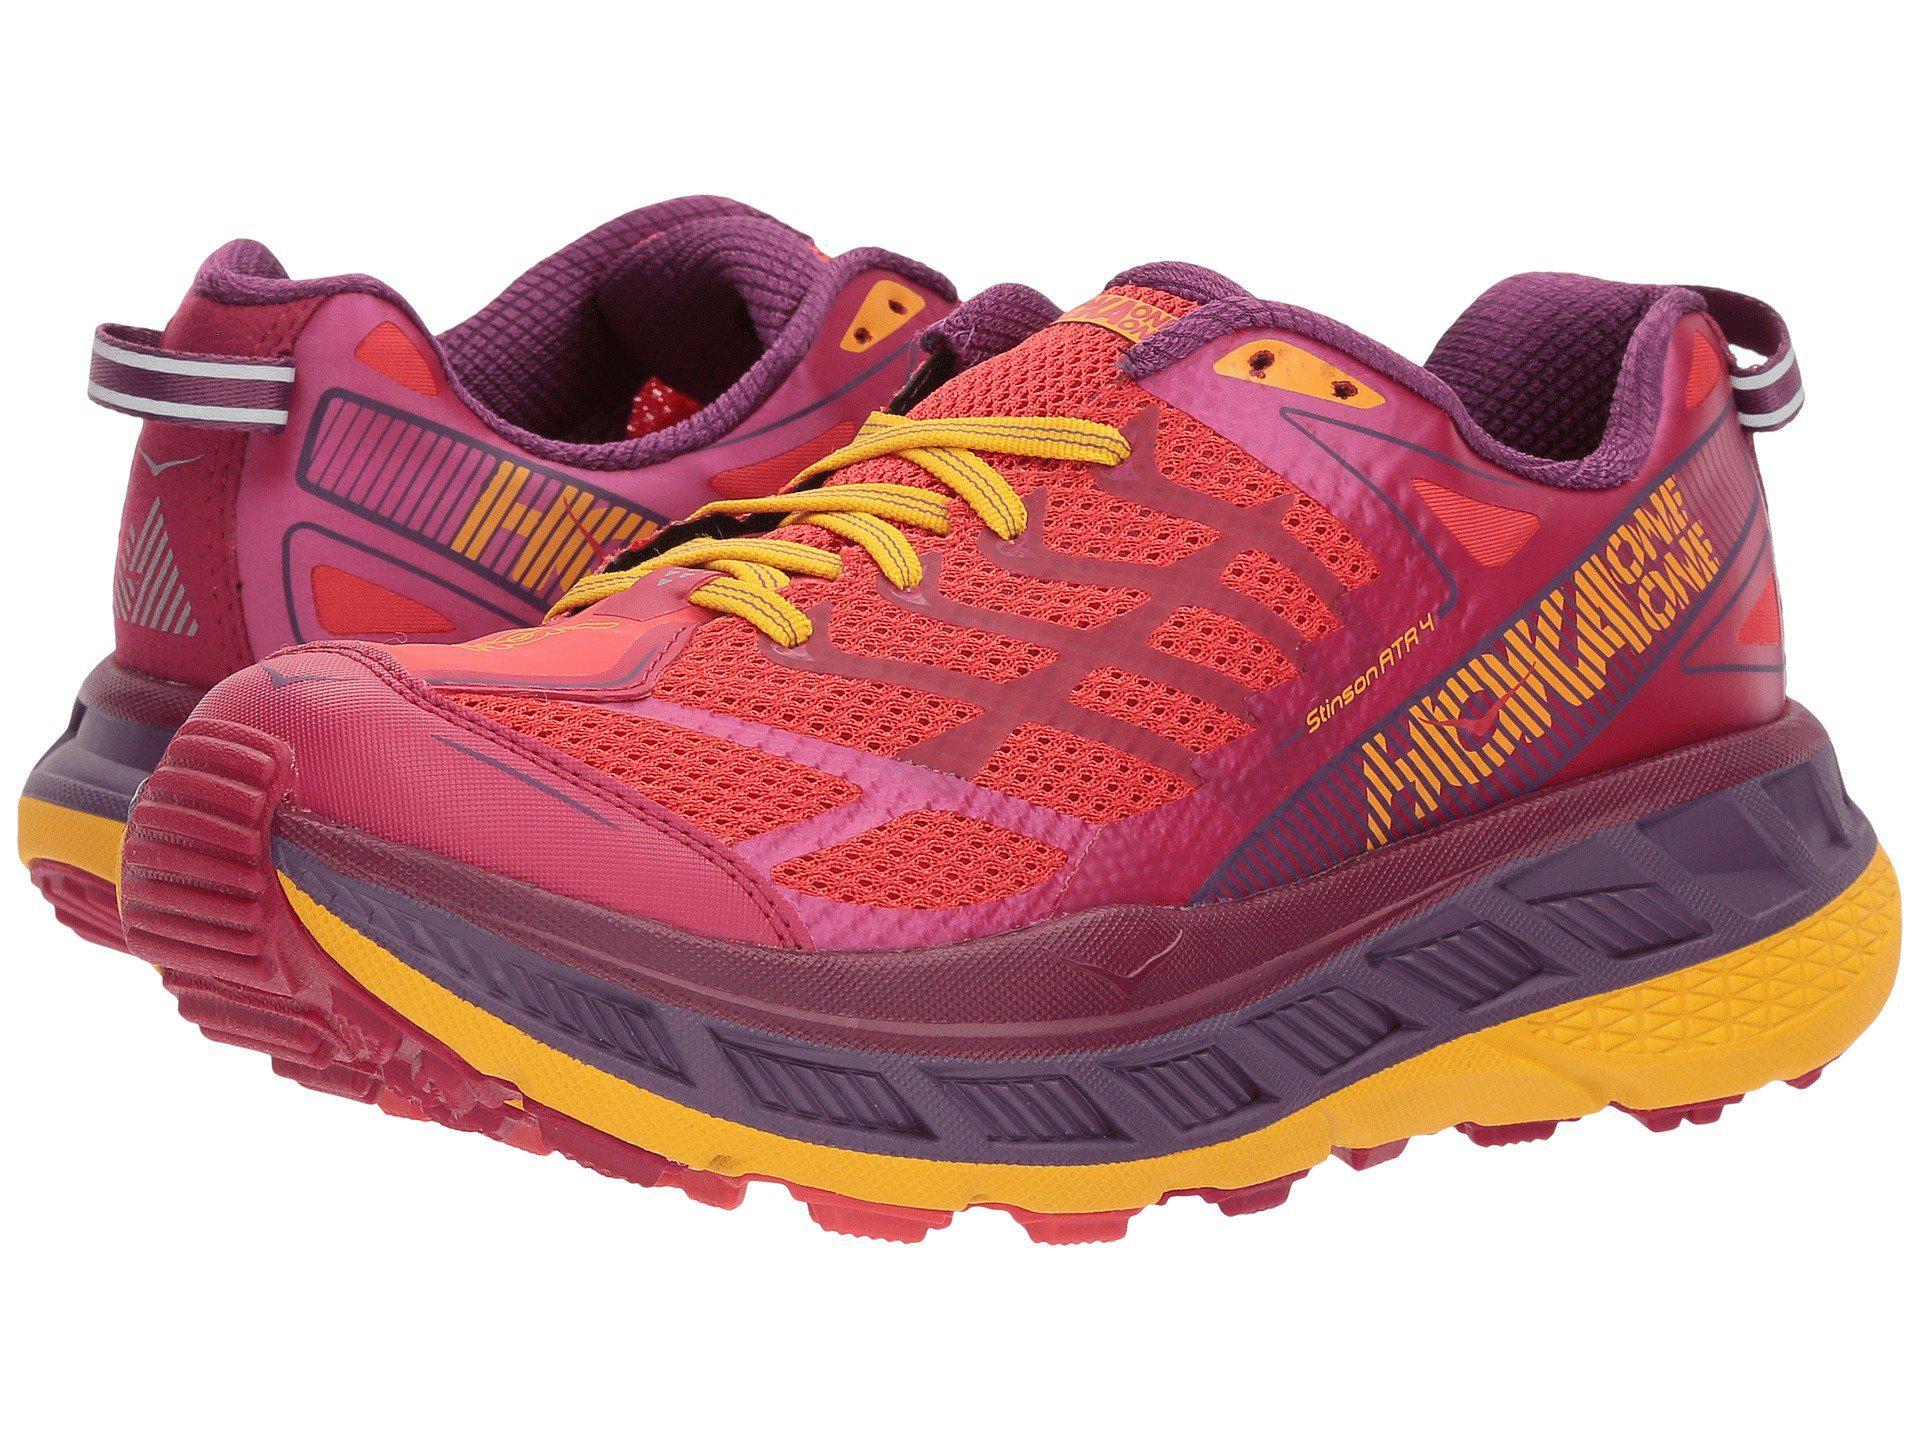 54b422028dd3 Hoka One One. Stinson Atr 4 (marlin neon Coral) Women s Running Shoes